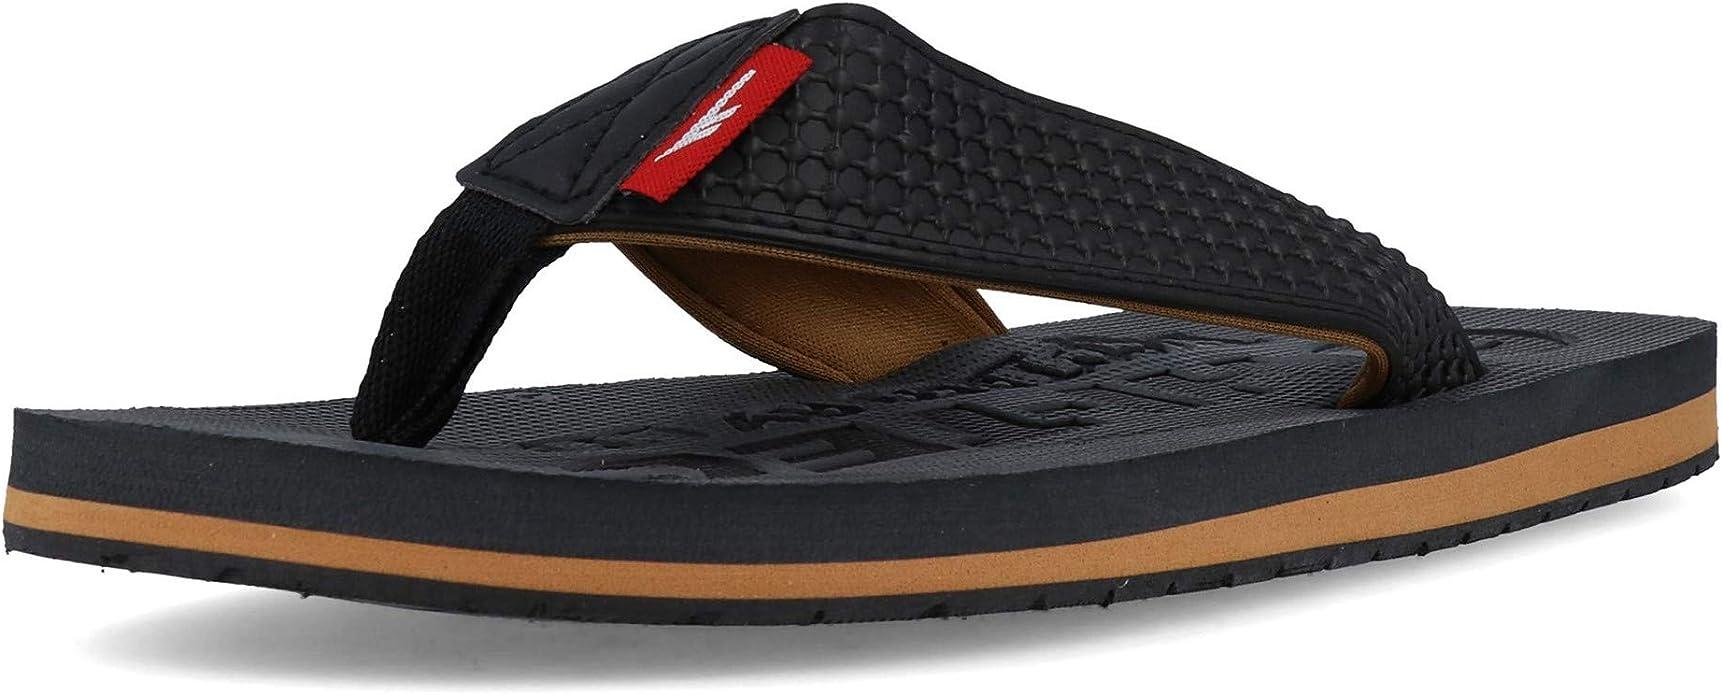 Hi-Tec Mens Shadow Thong Shoes Sandals Black Grey Sports Breathable Lightweight